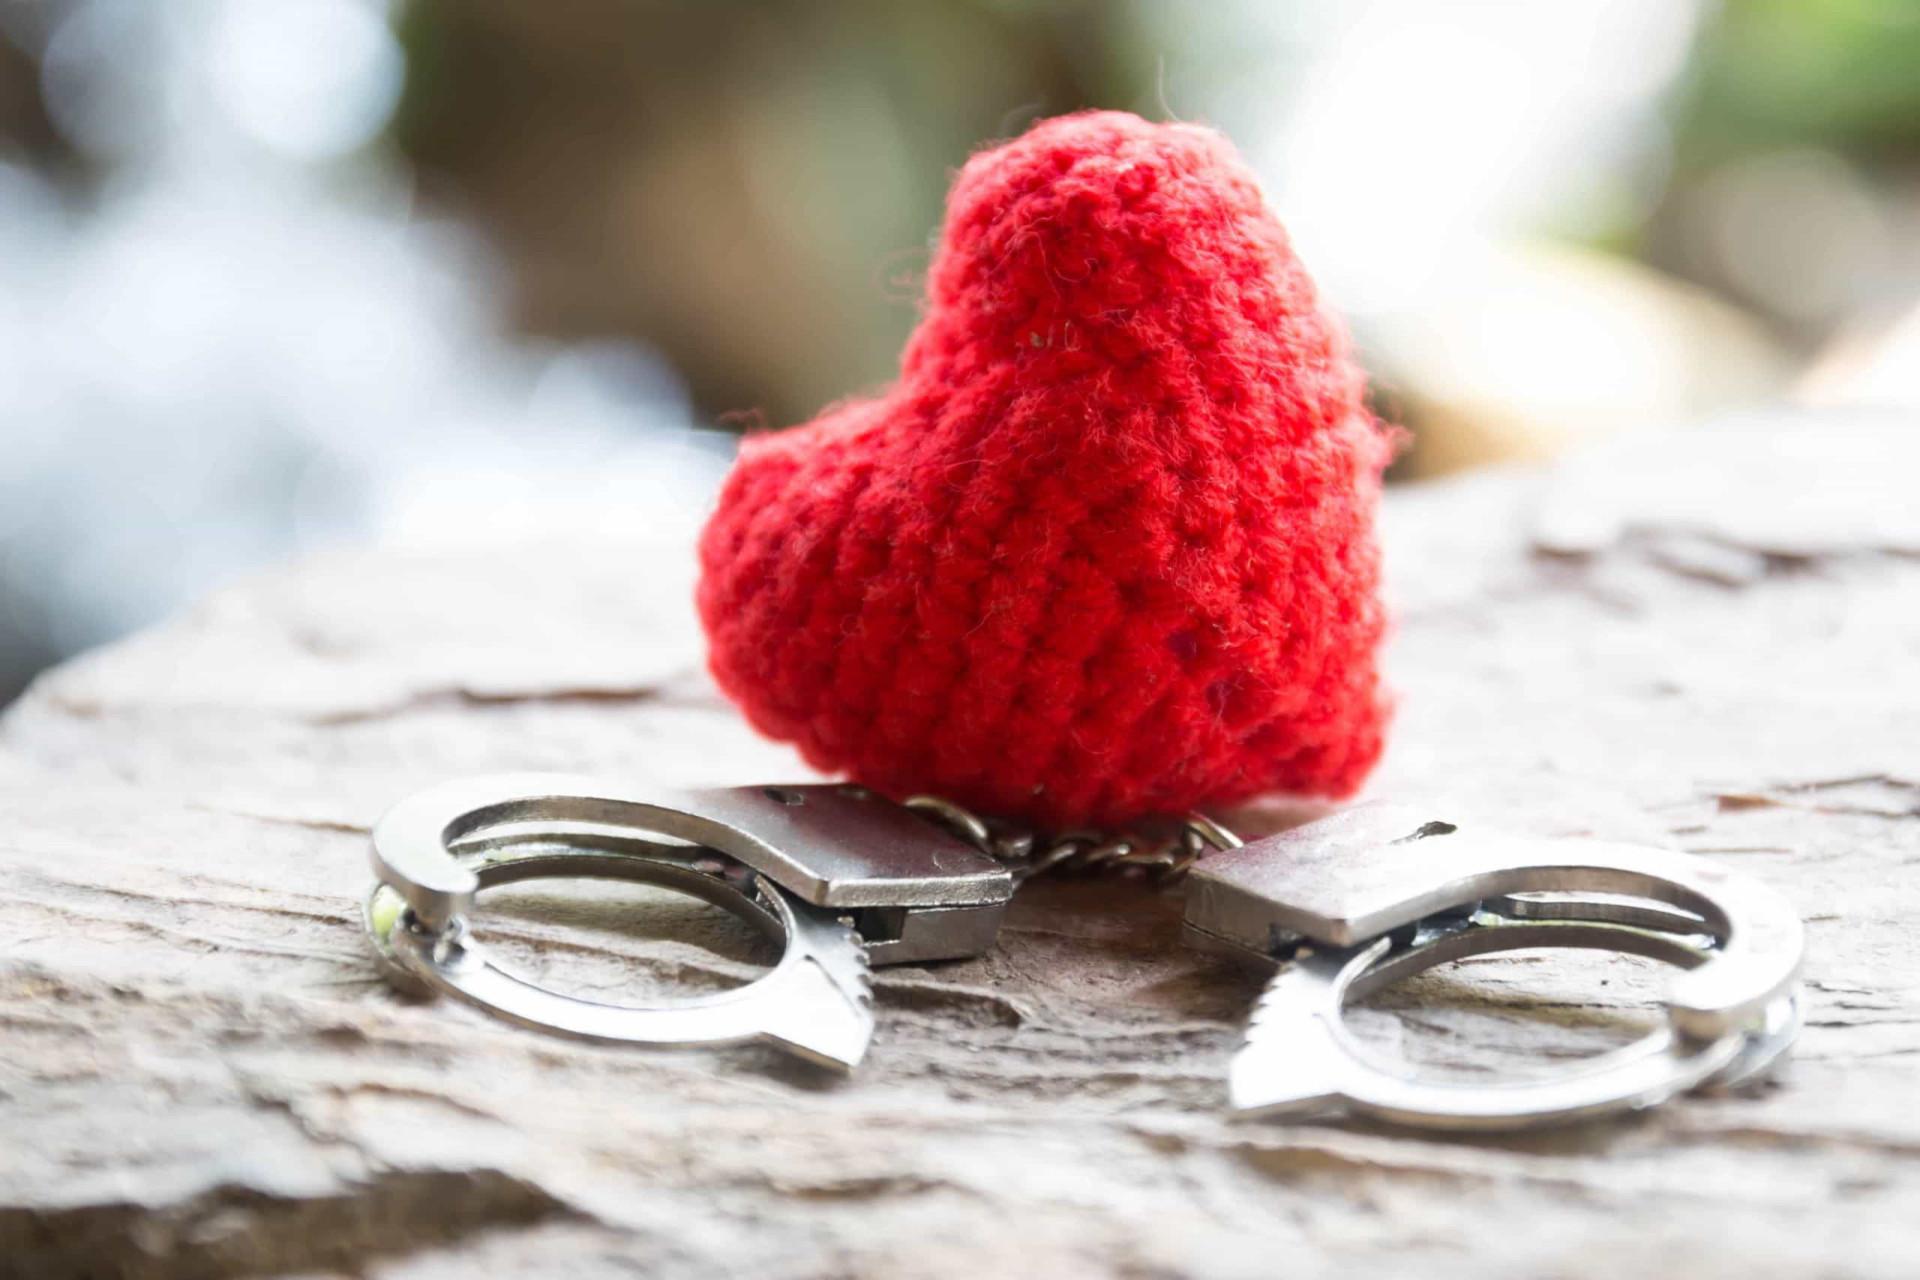 Gruesome Valentine's Day murders